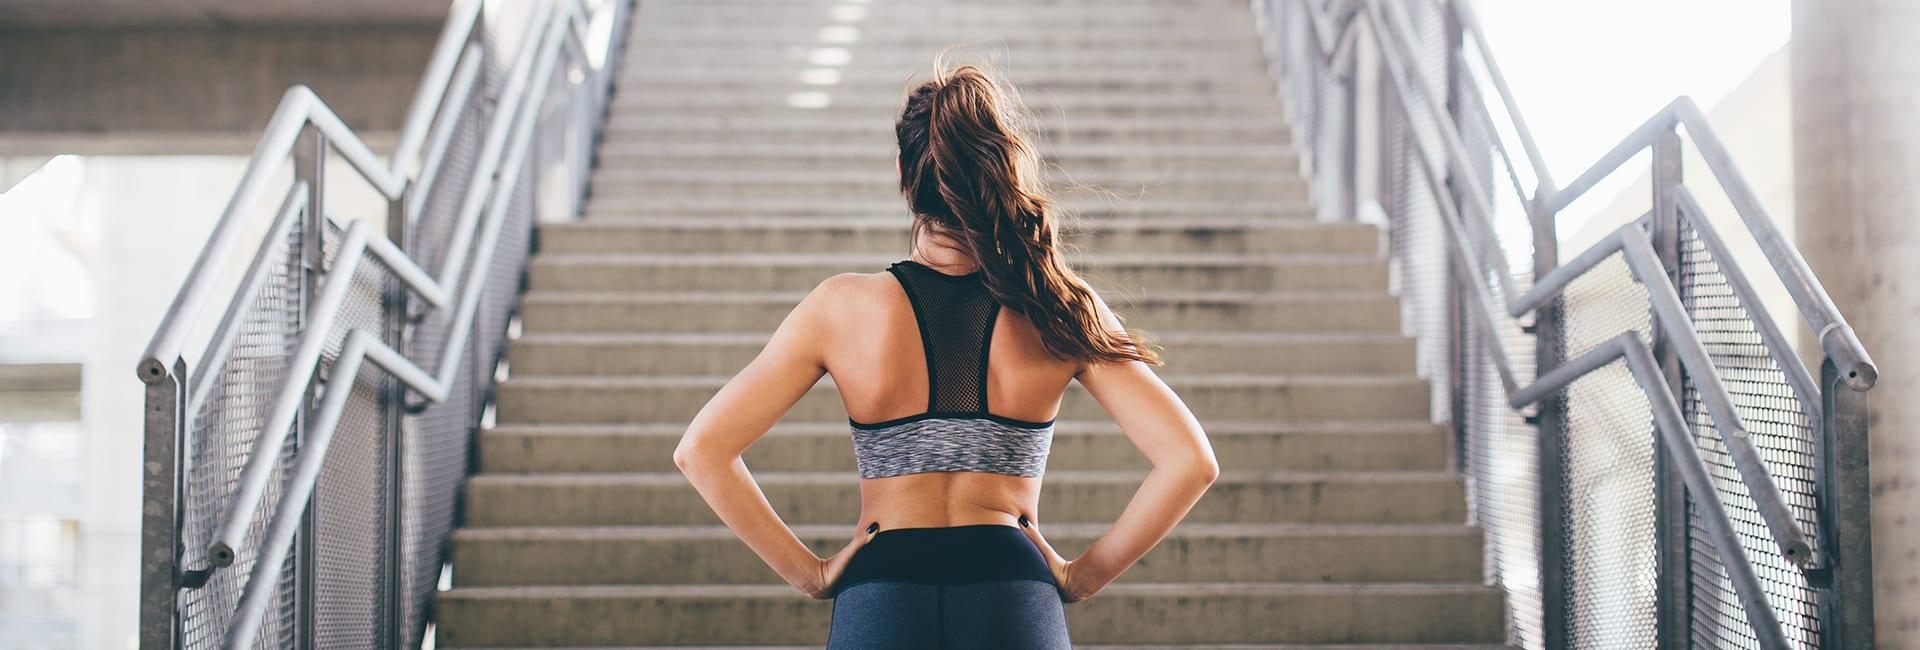 5 tips para retomar la rutina deportiva